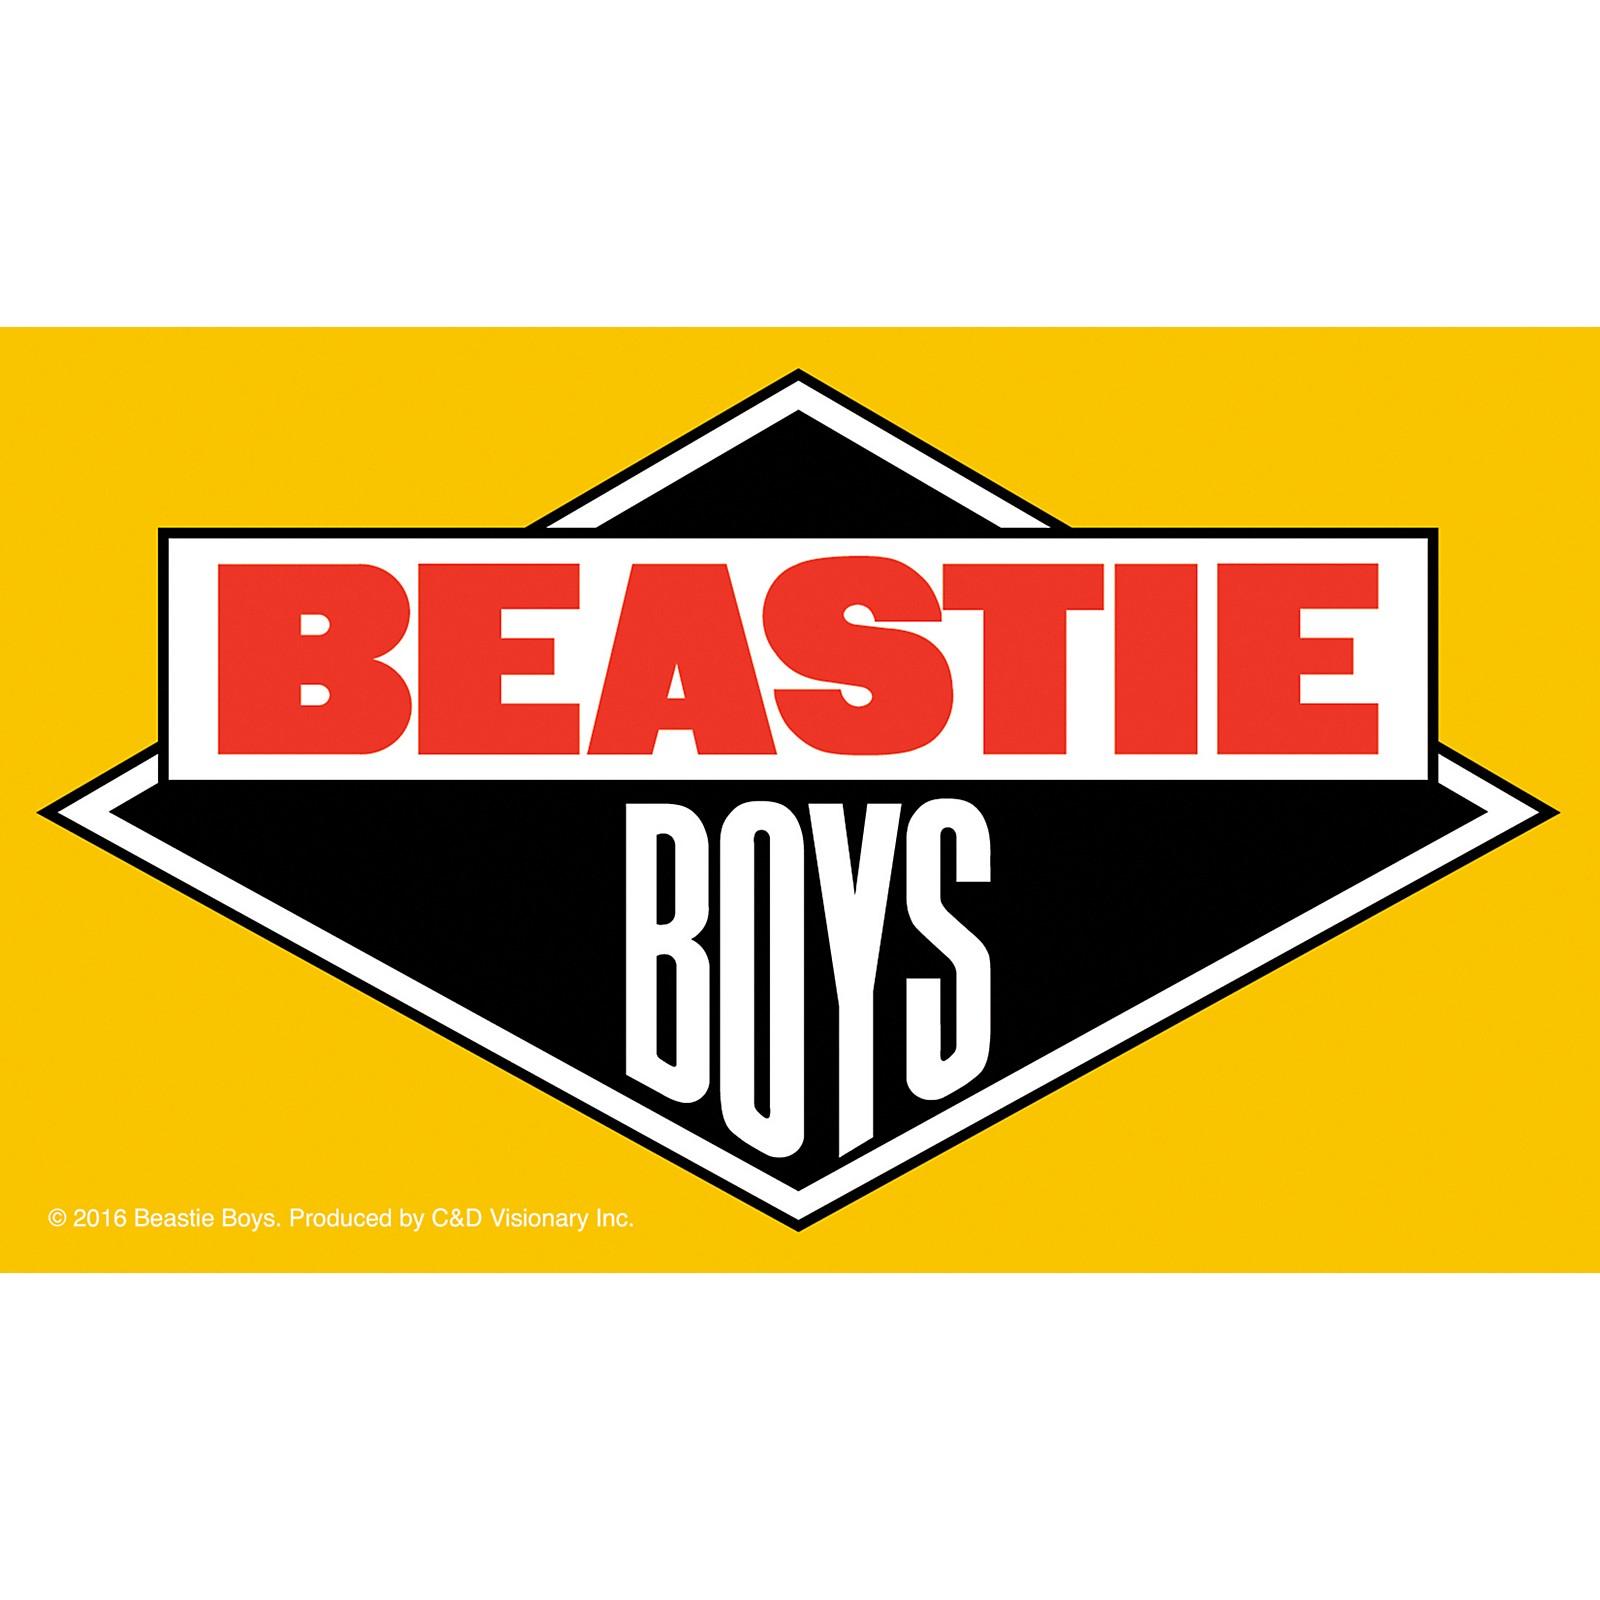 C&D Visionary Beastie Boys License To Ill Sticker